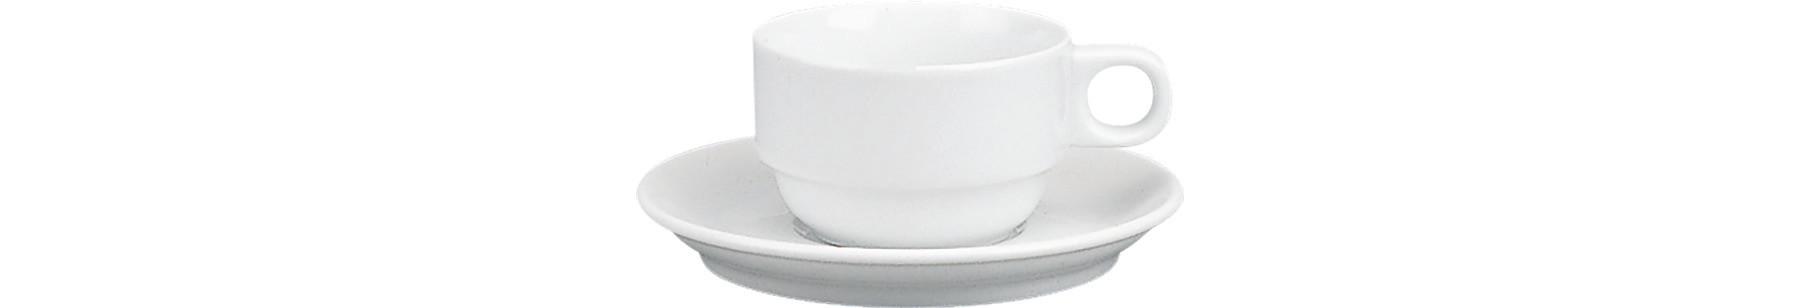 898/598, Tasse nieder stapelbar K/09 ø 66 mm / 0,09 l Form 898